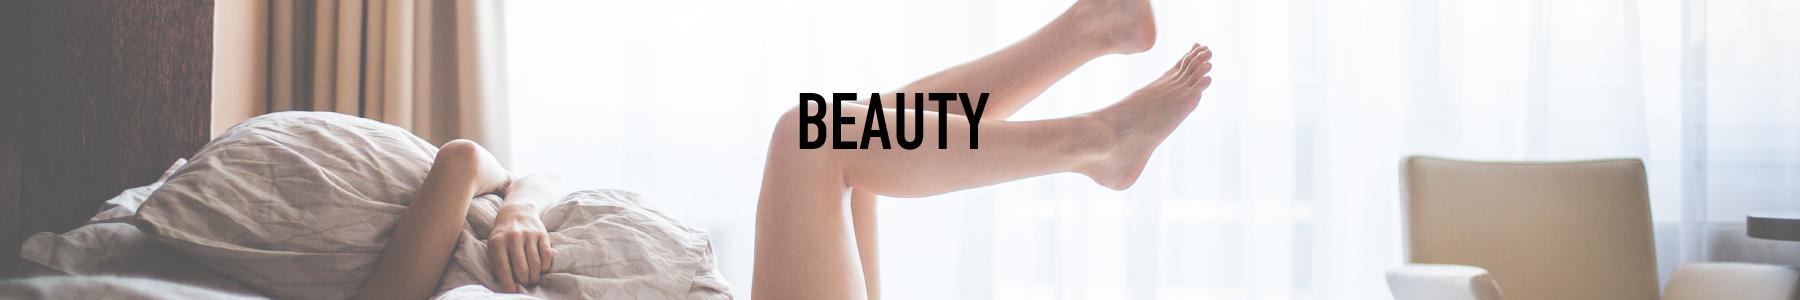 Pc beauty